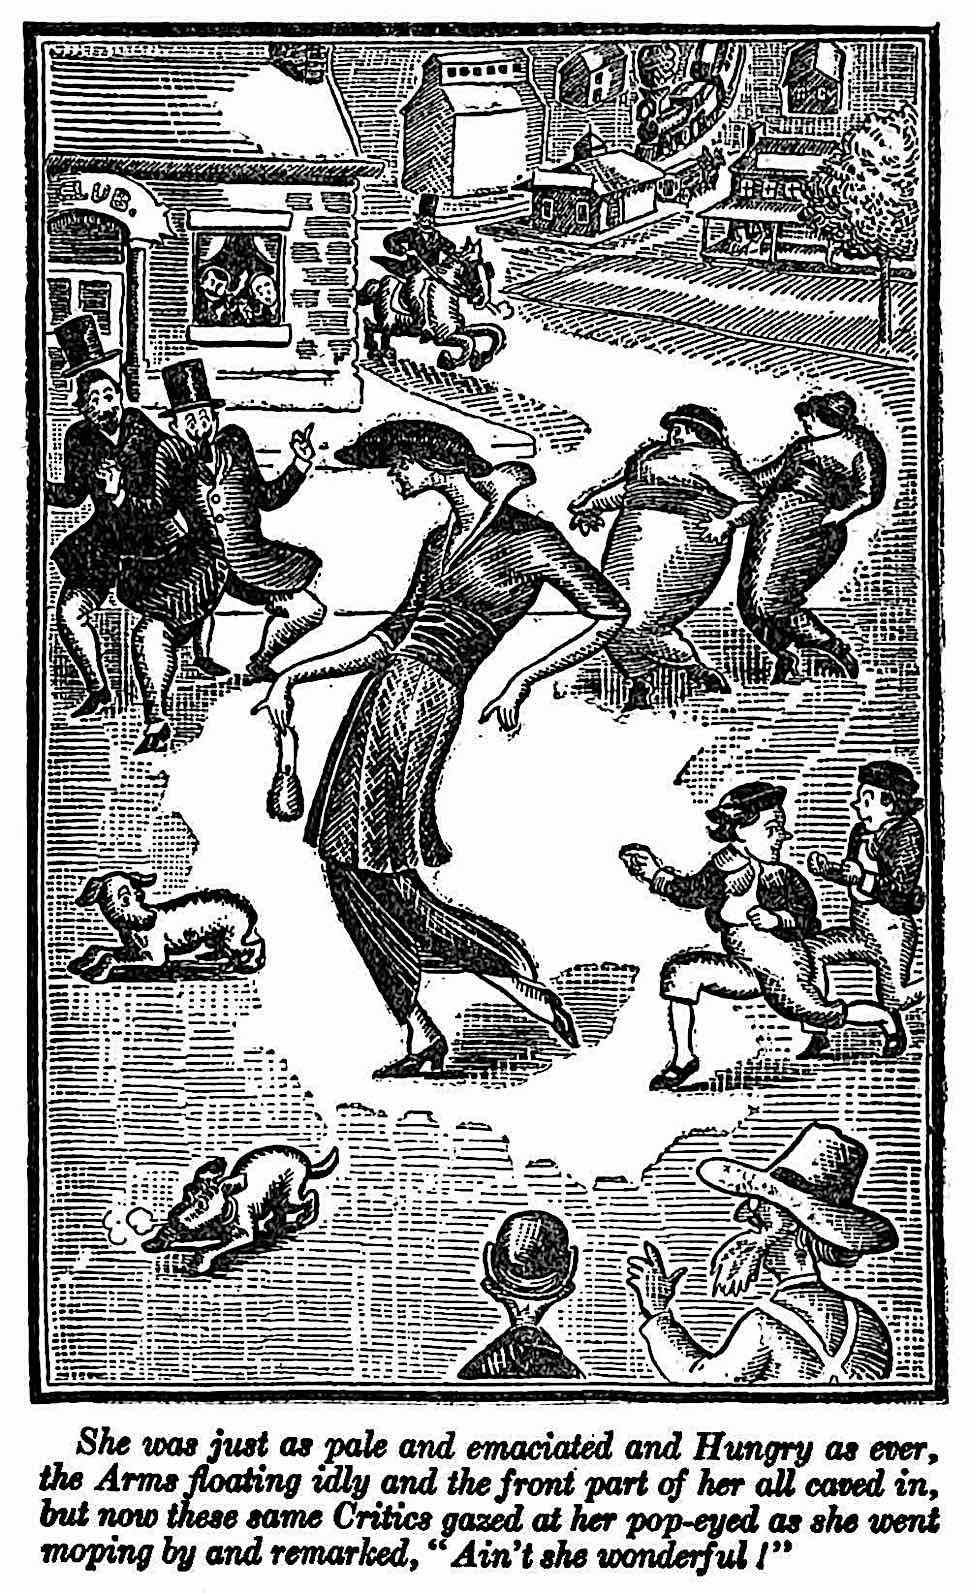 a John P. McCutcheon 1920 cartoon illustration